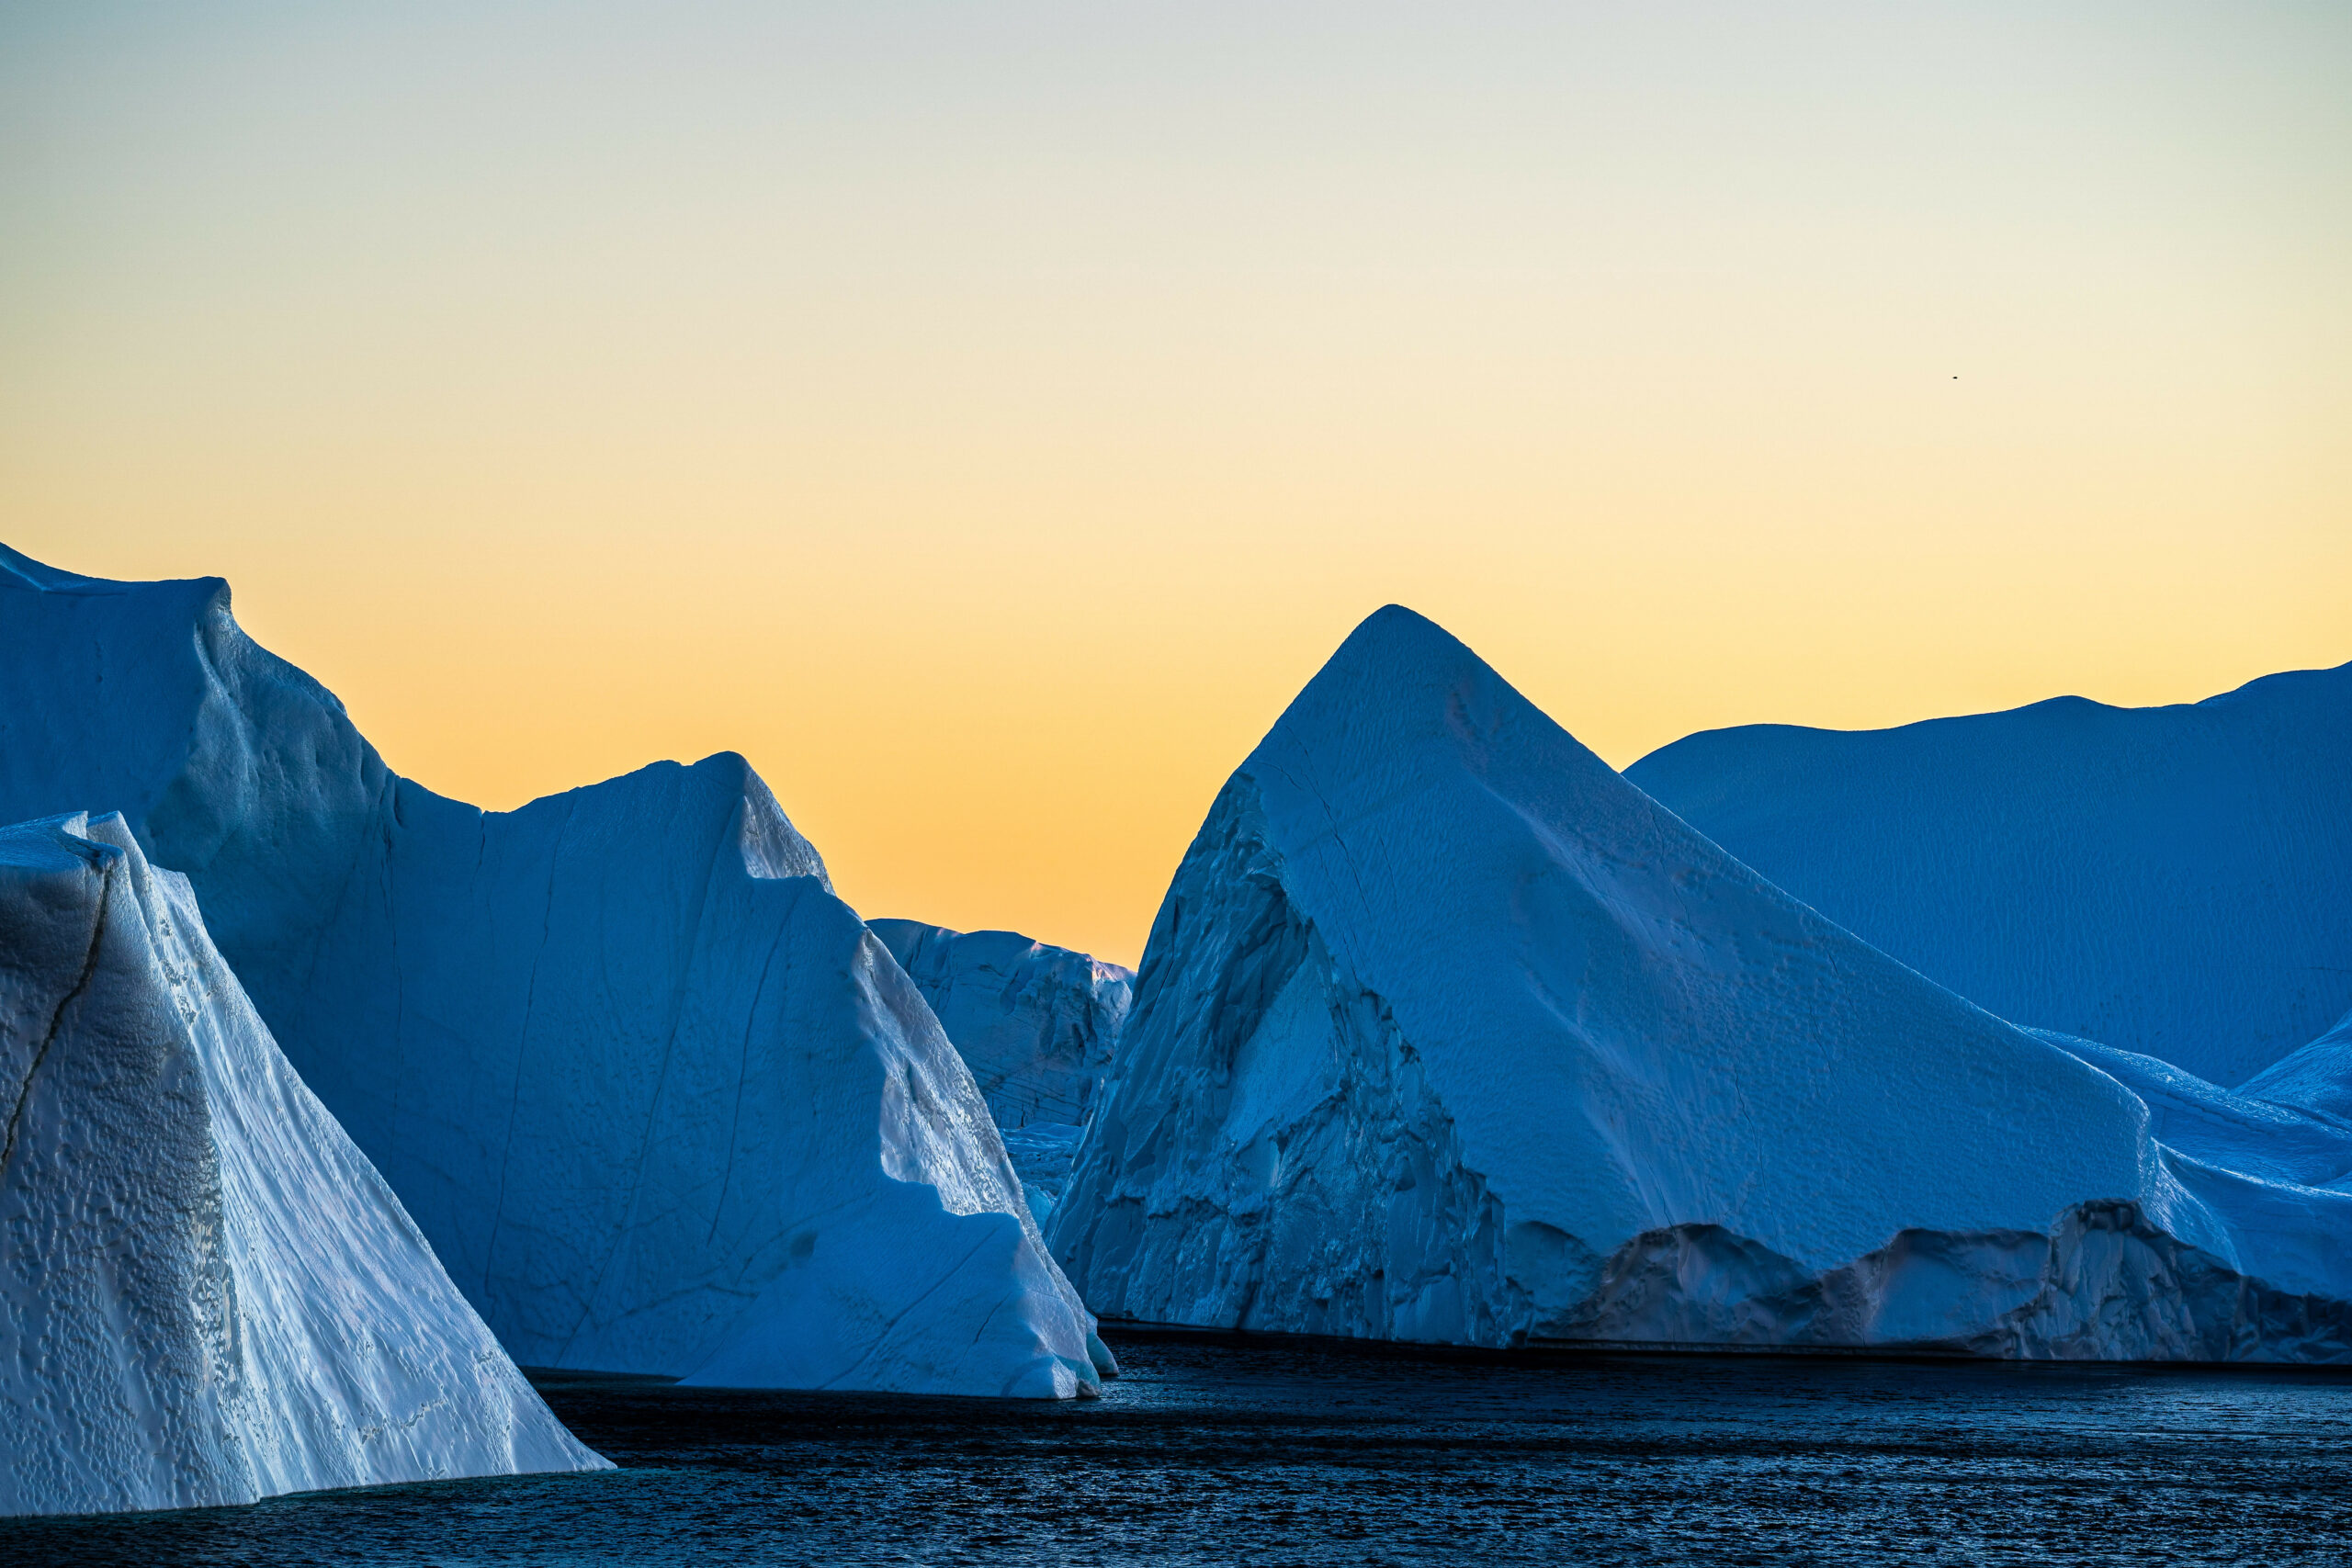 Icebergs near Ilulissat, Greenland. Credit: Ulrik Pedersen/NurPhoto via Getty Images